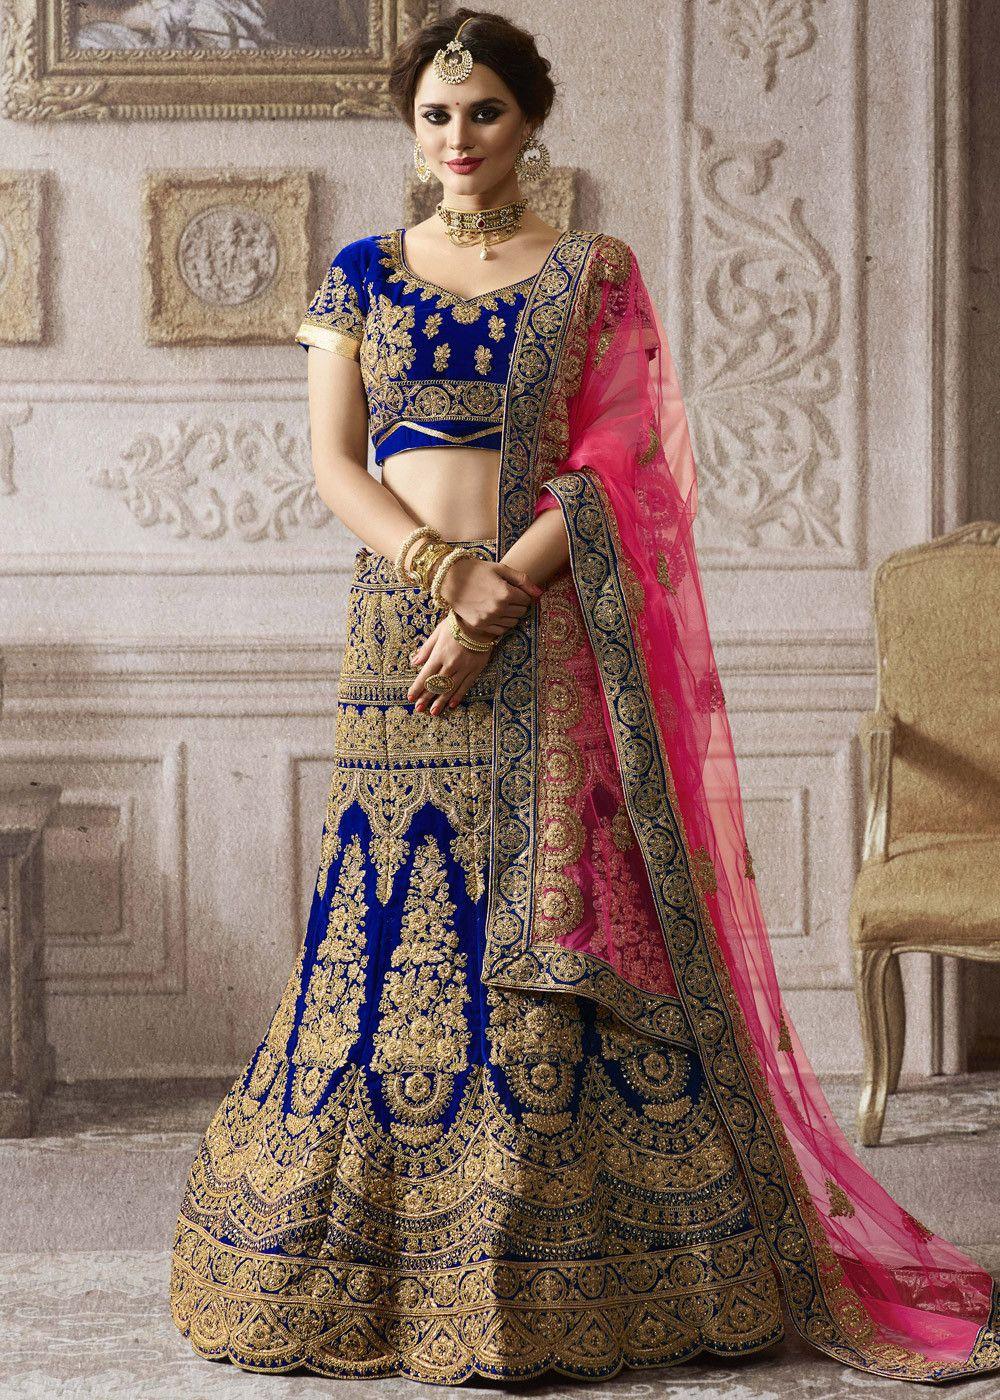 d4f0e63fb8 Blue Velvet Bridal Lehenga Choli with all over heavy zari embroidery and  kundan work.